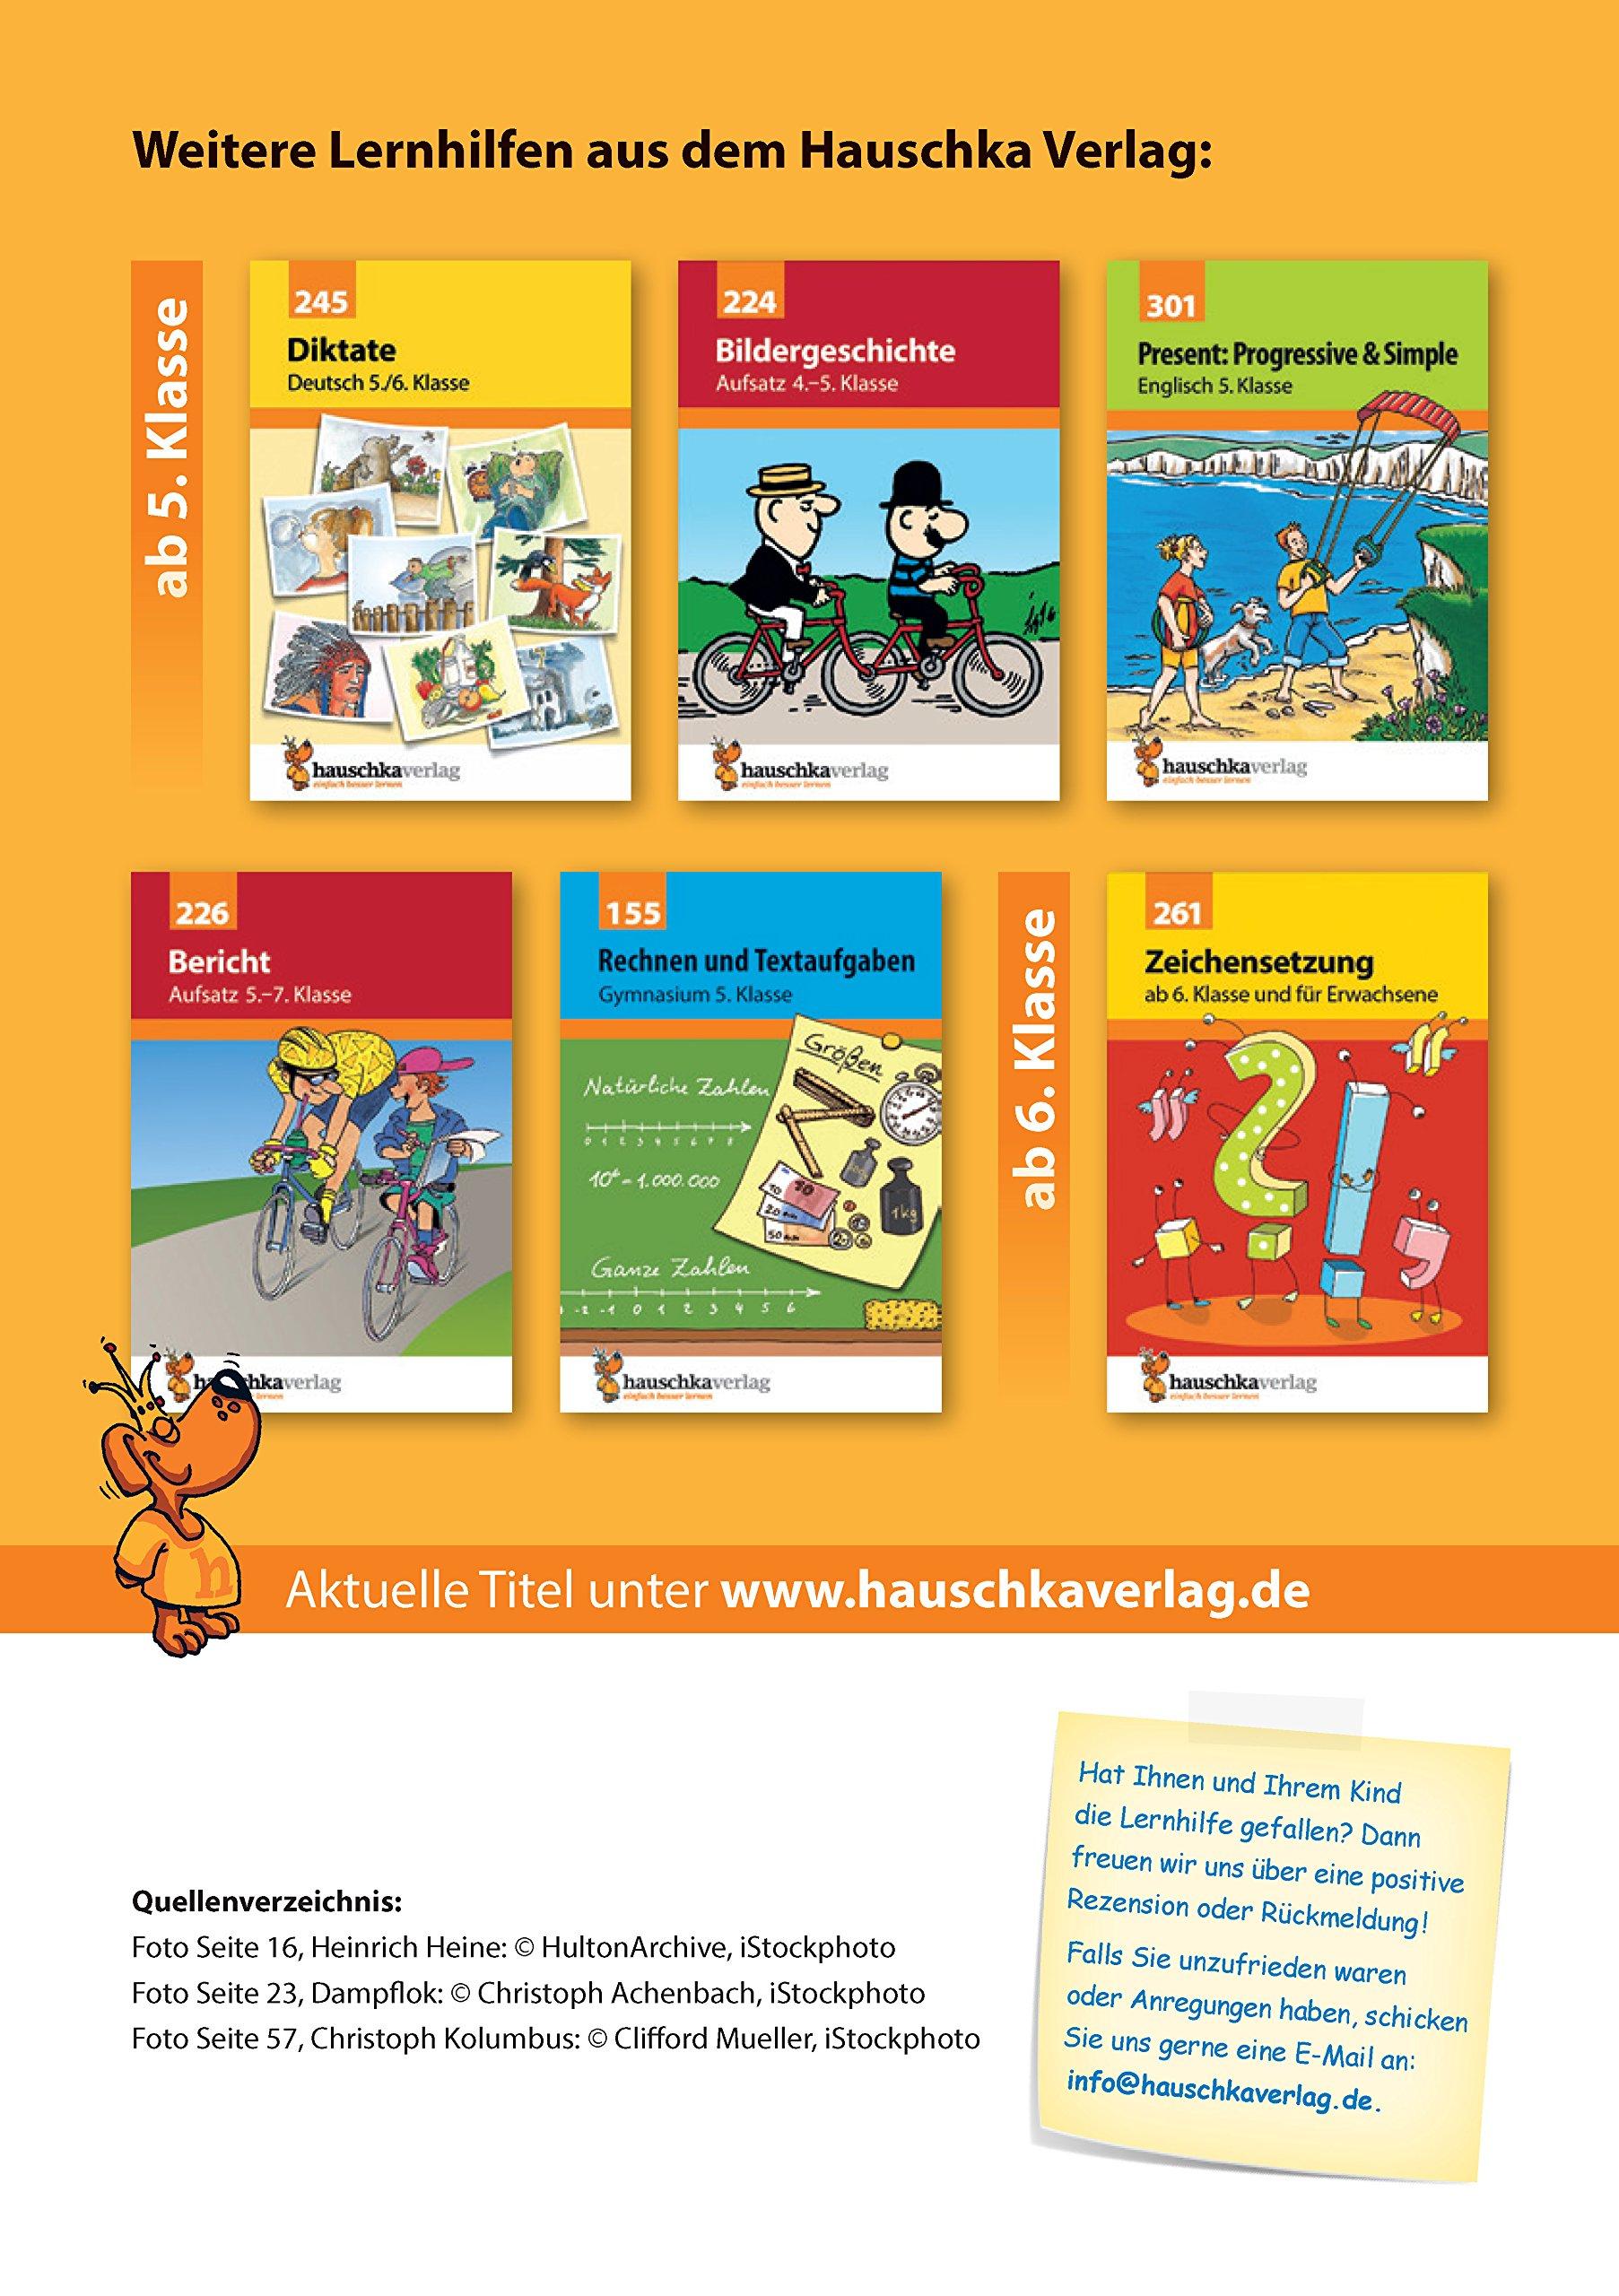 Grammatik 5. - 7. Klasse.: Amazon.de: Gerhard Widmann, Mascha Greune ...